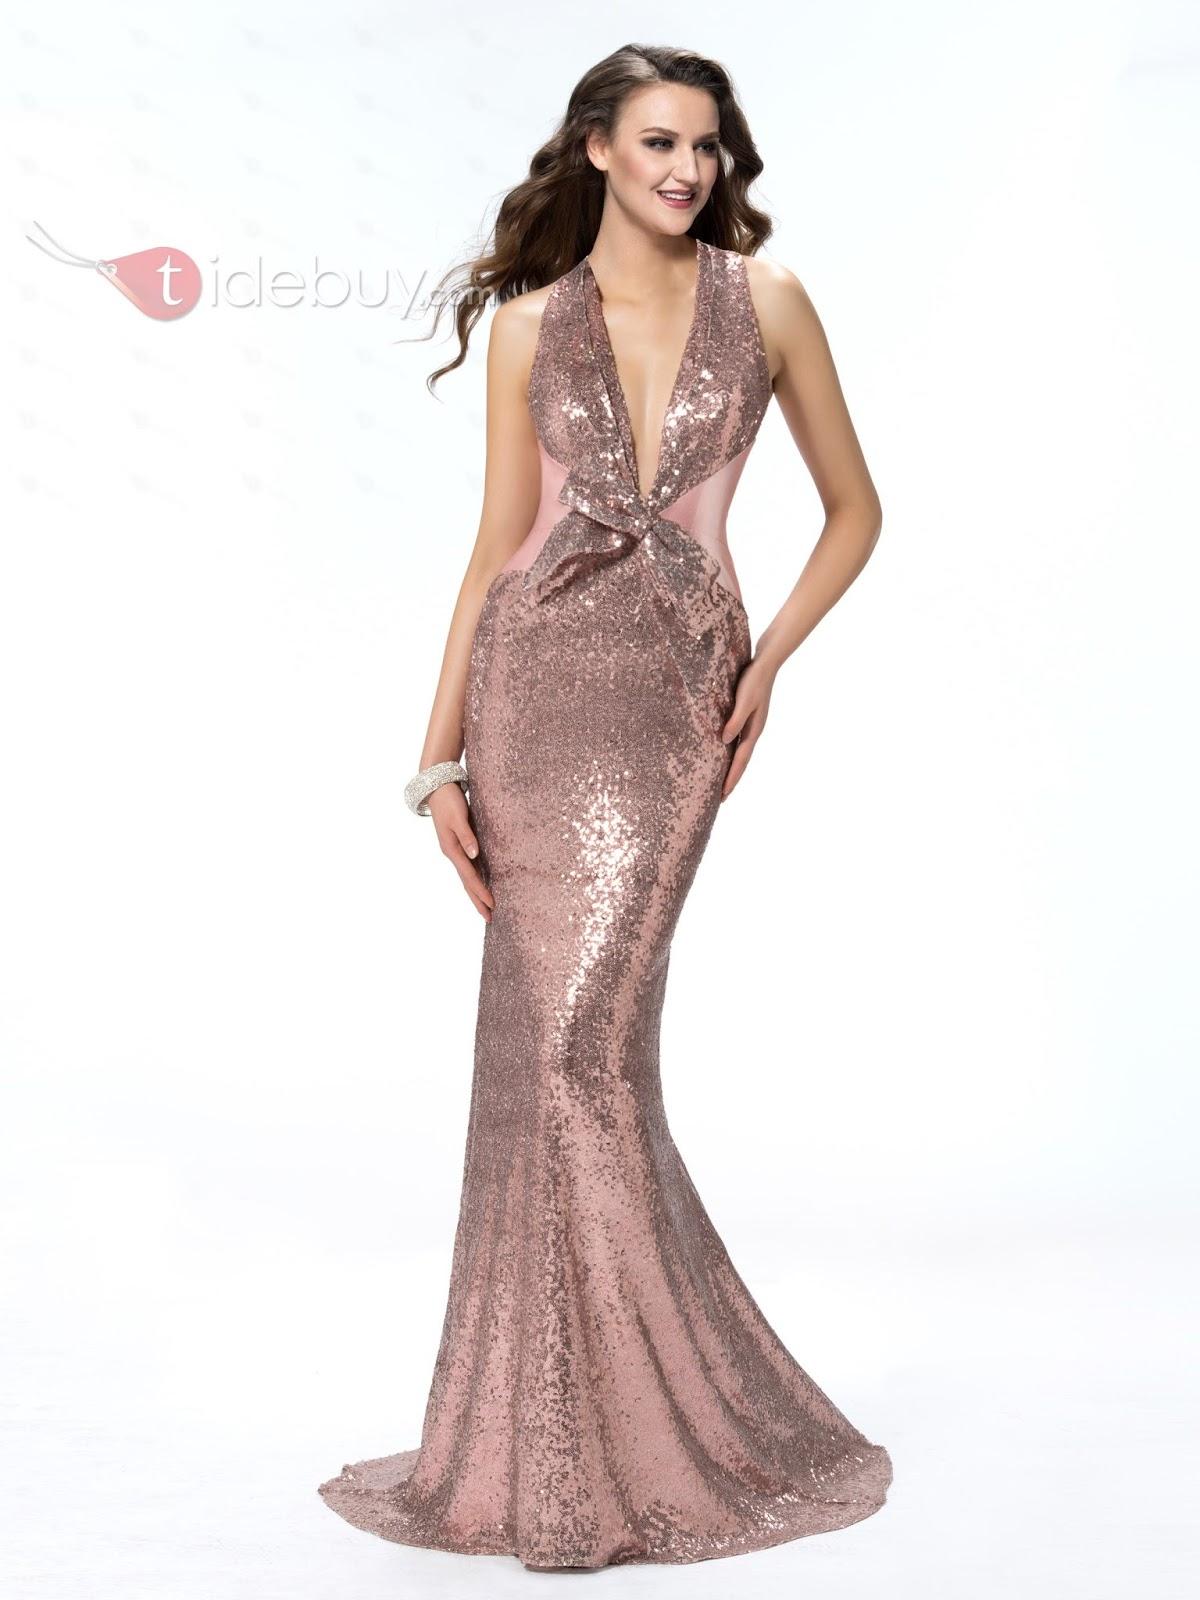 http://www.tidebuy.com/c/Designer-Dresses-103885/designer/2/